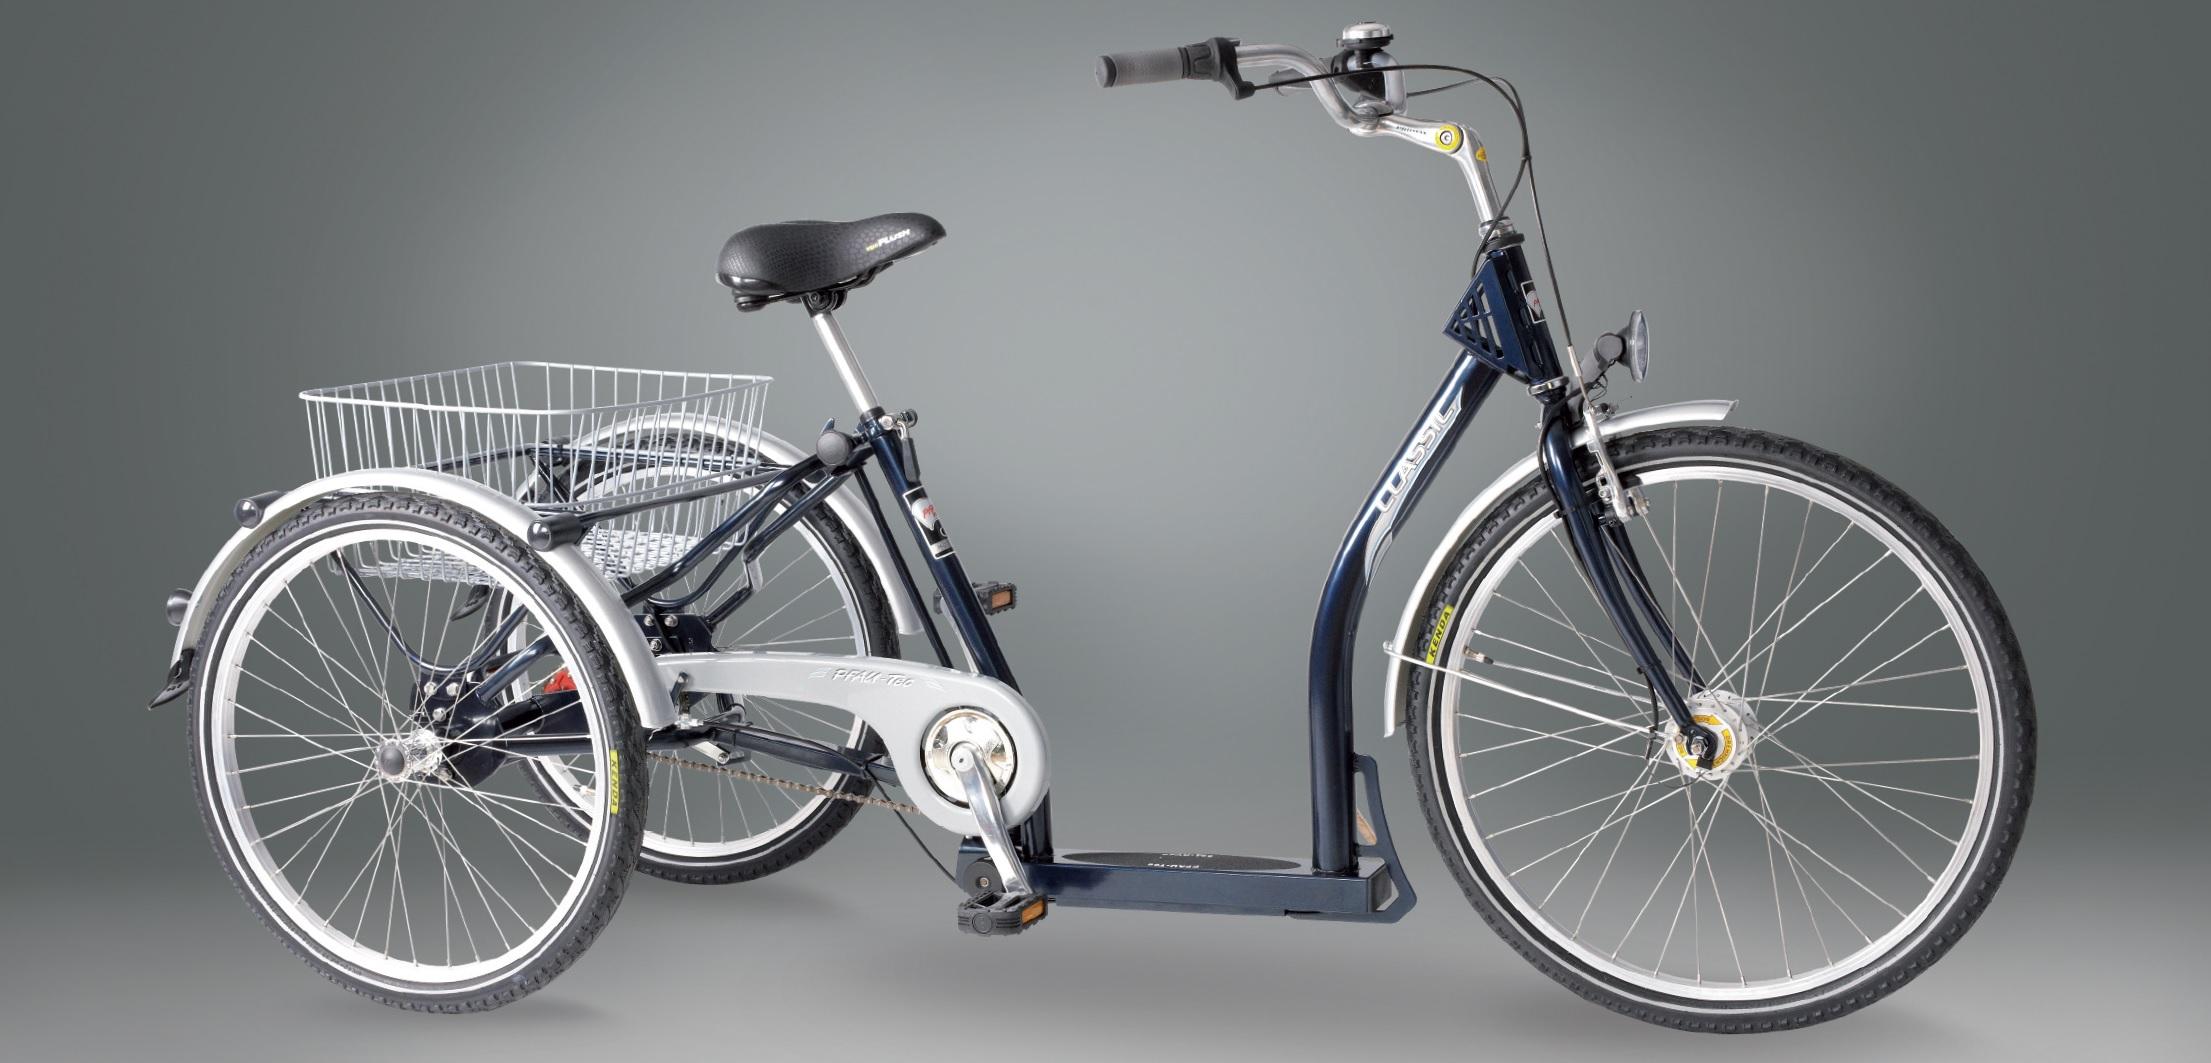 Dreirad Elegance in dunkelblau